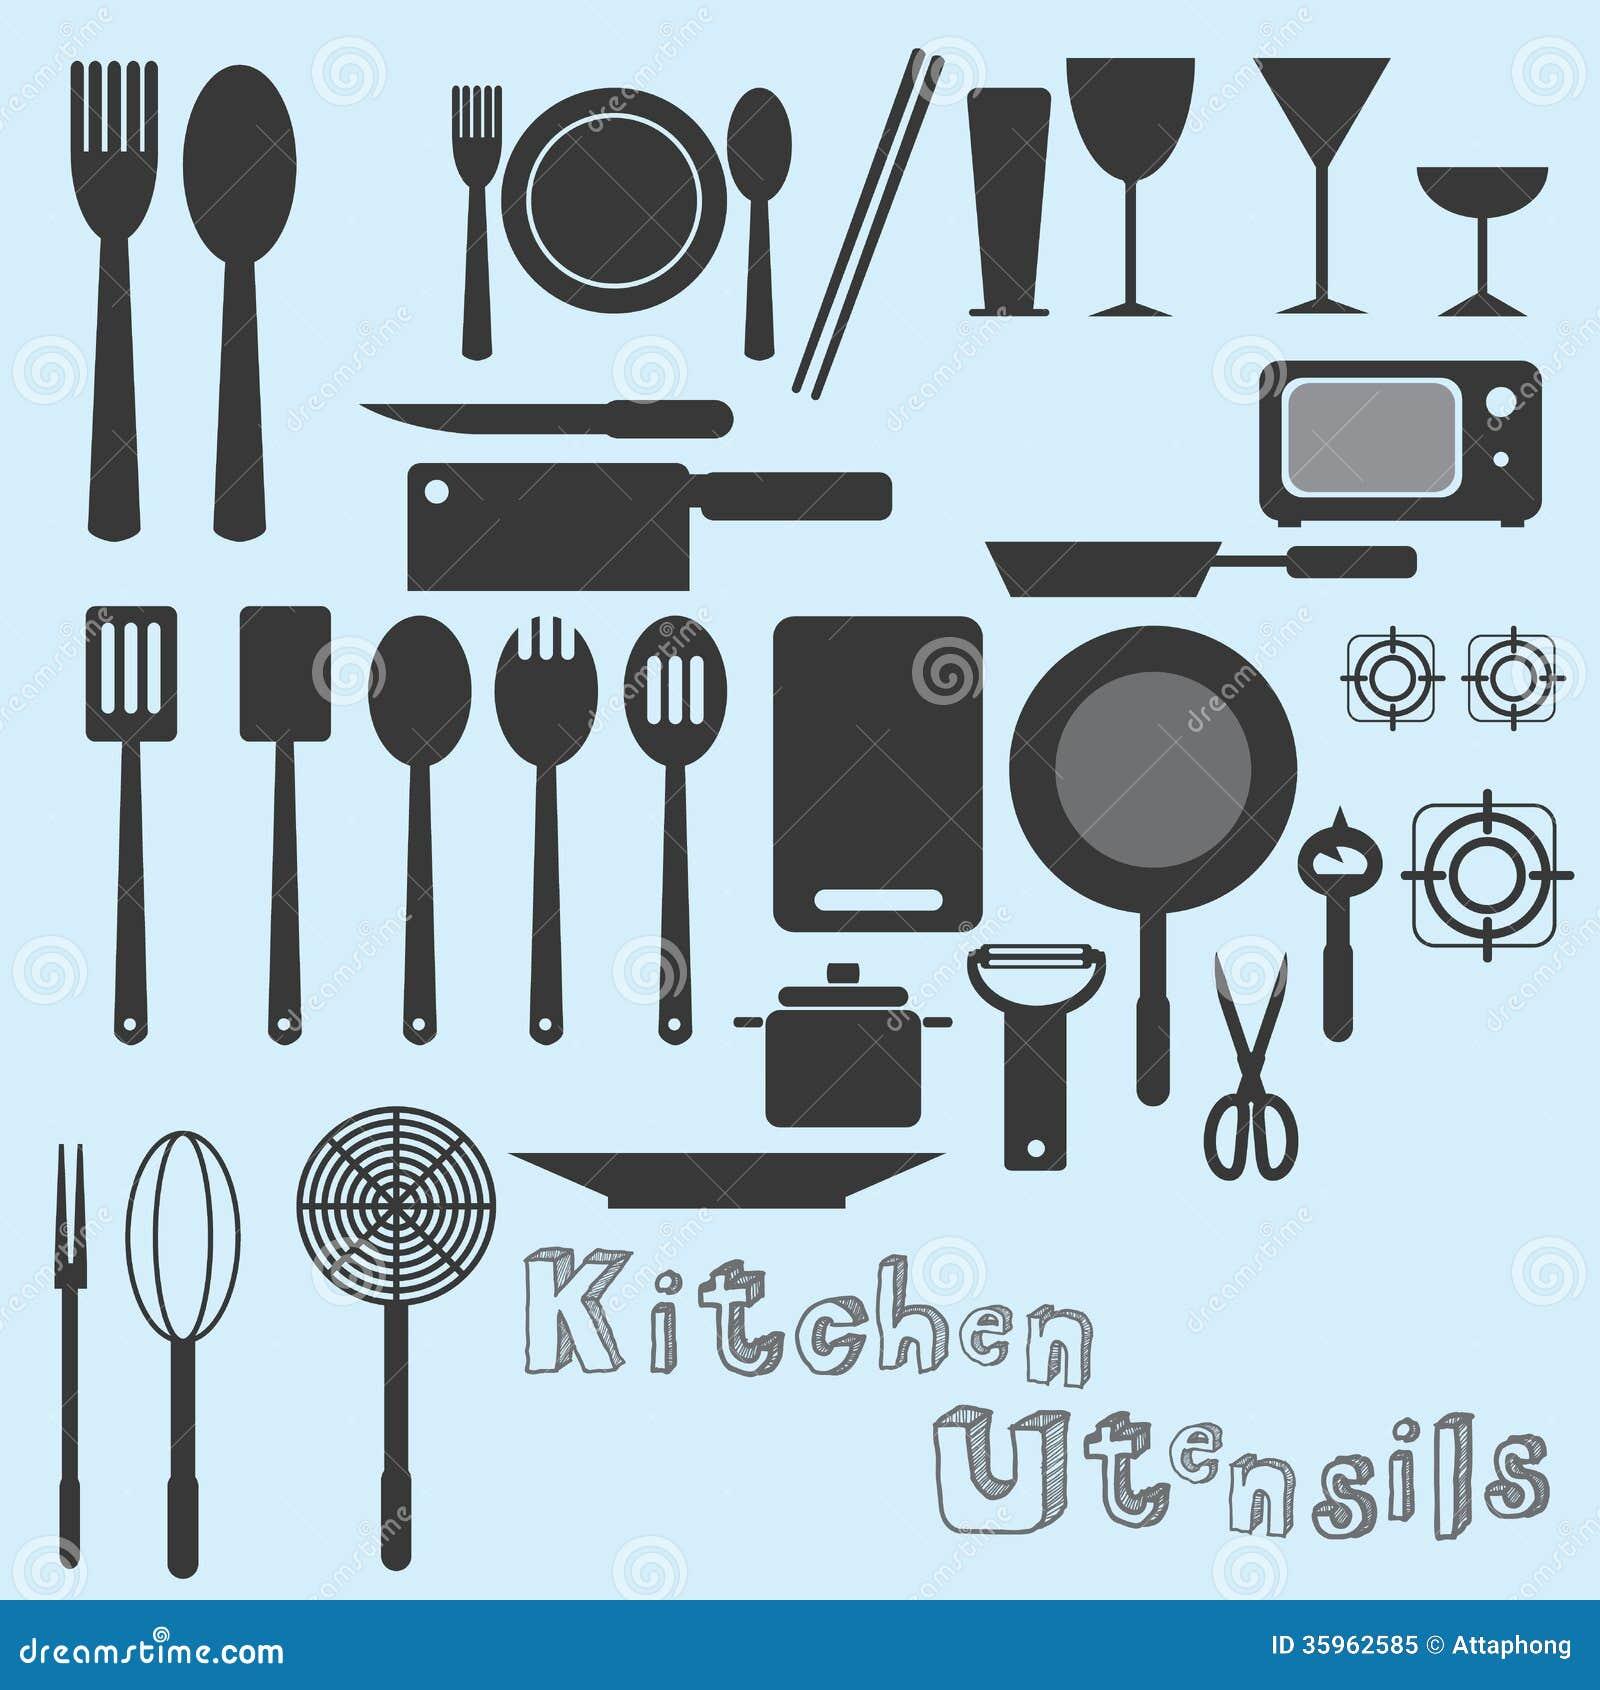 Kitchen Utensils Vector stock vector. Illustration of vector - 35962585